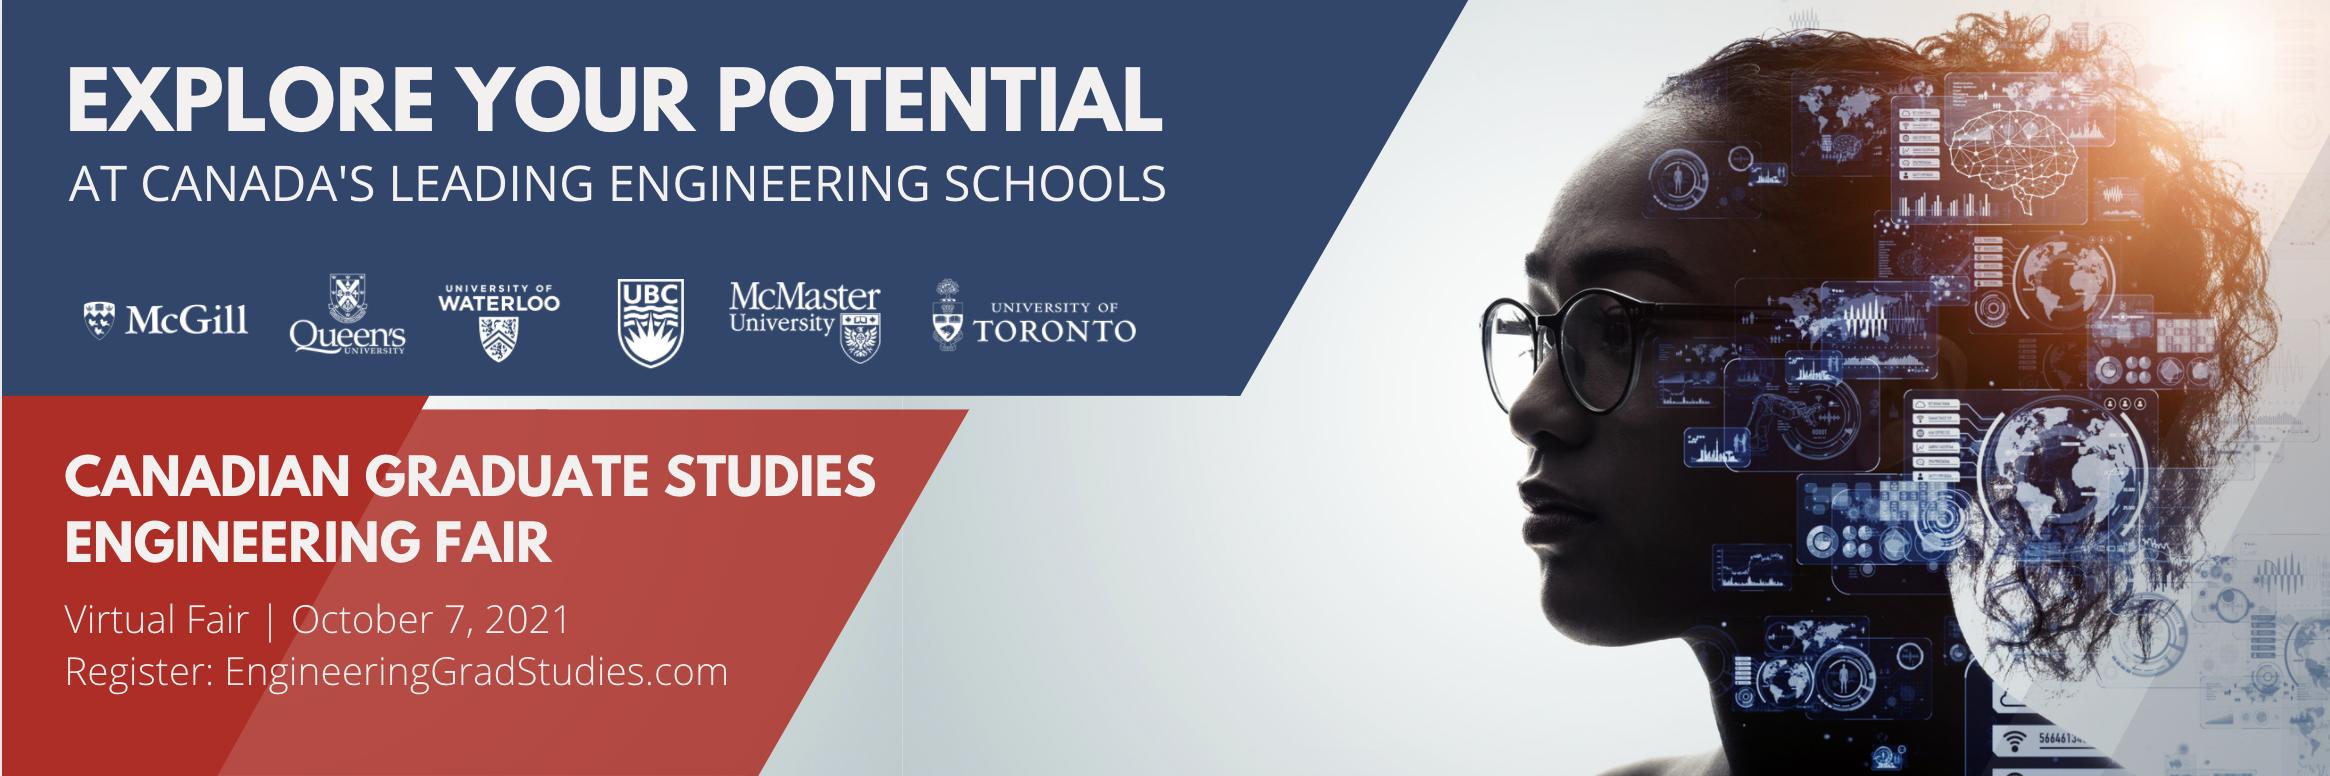 Canadian Graduate Studies Engineering Fair banner